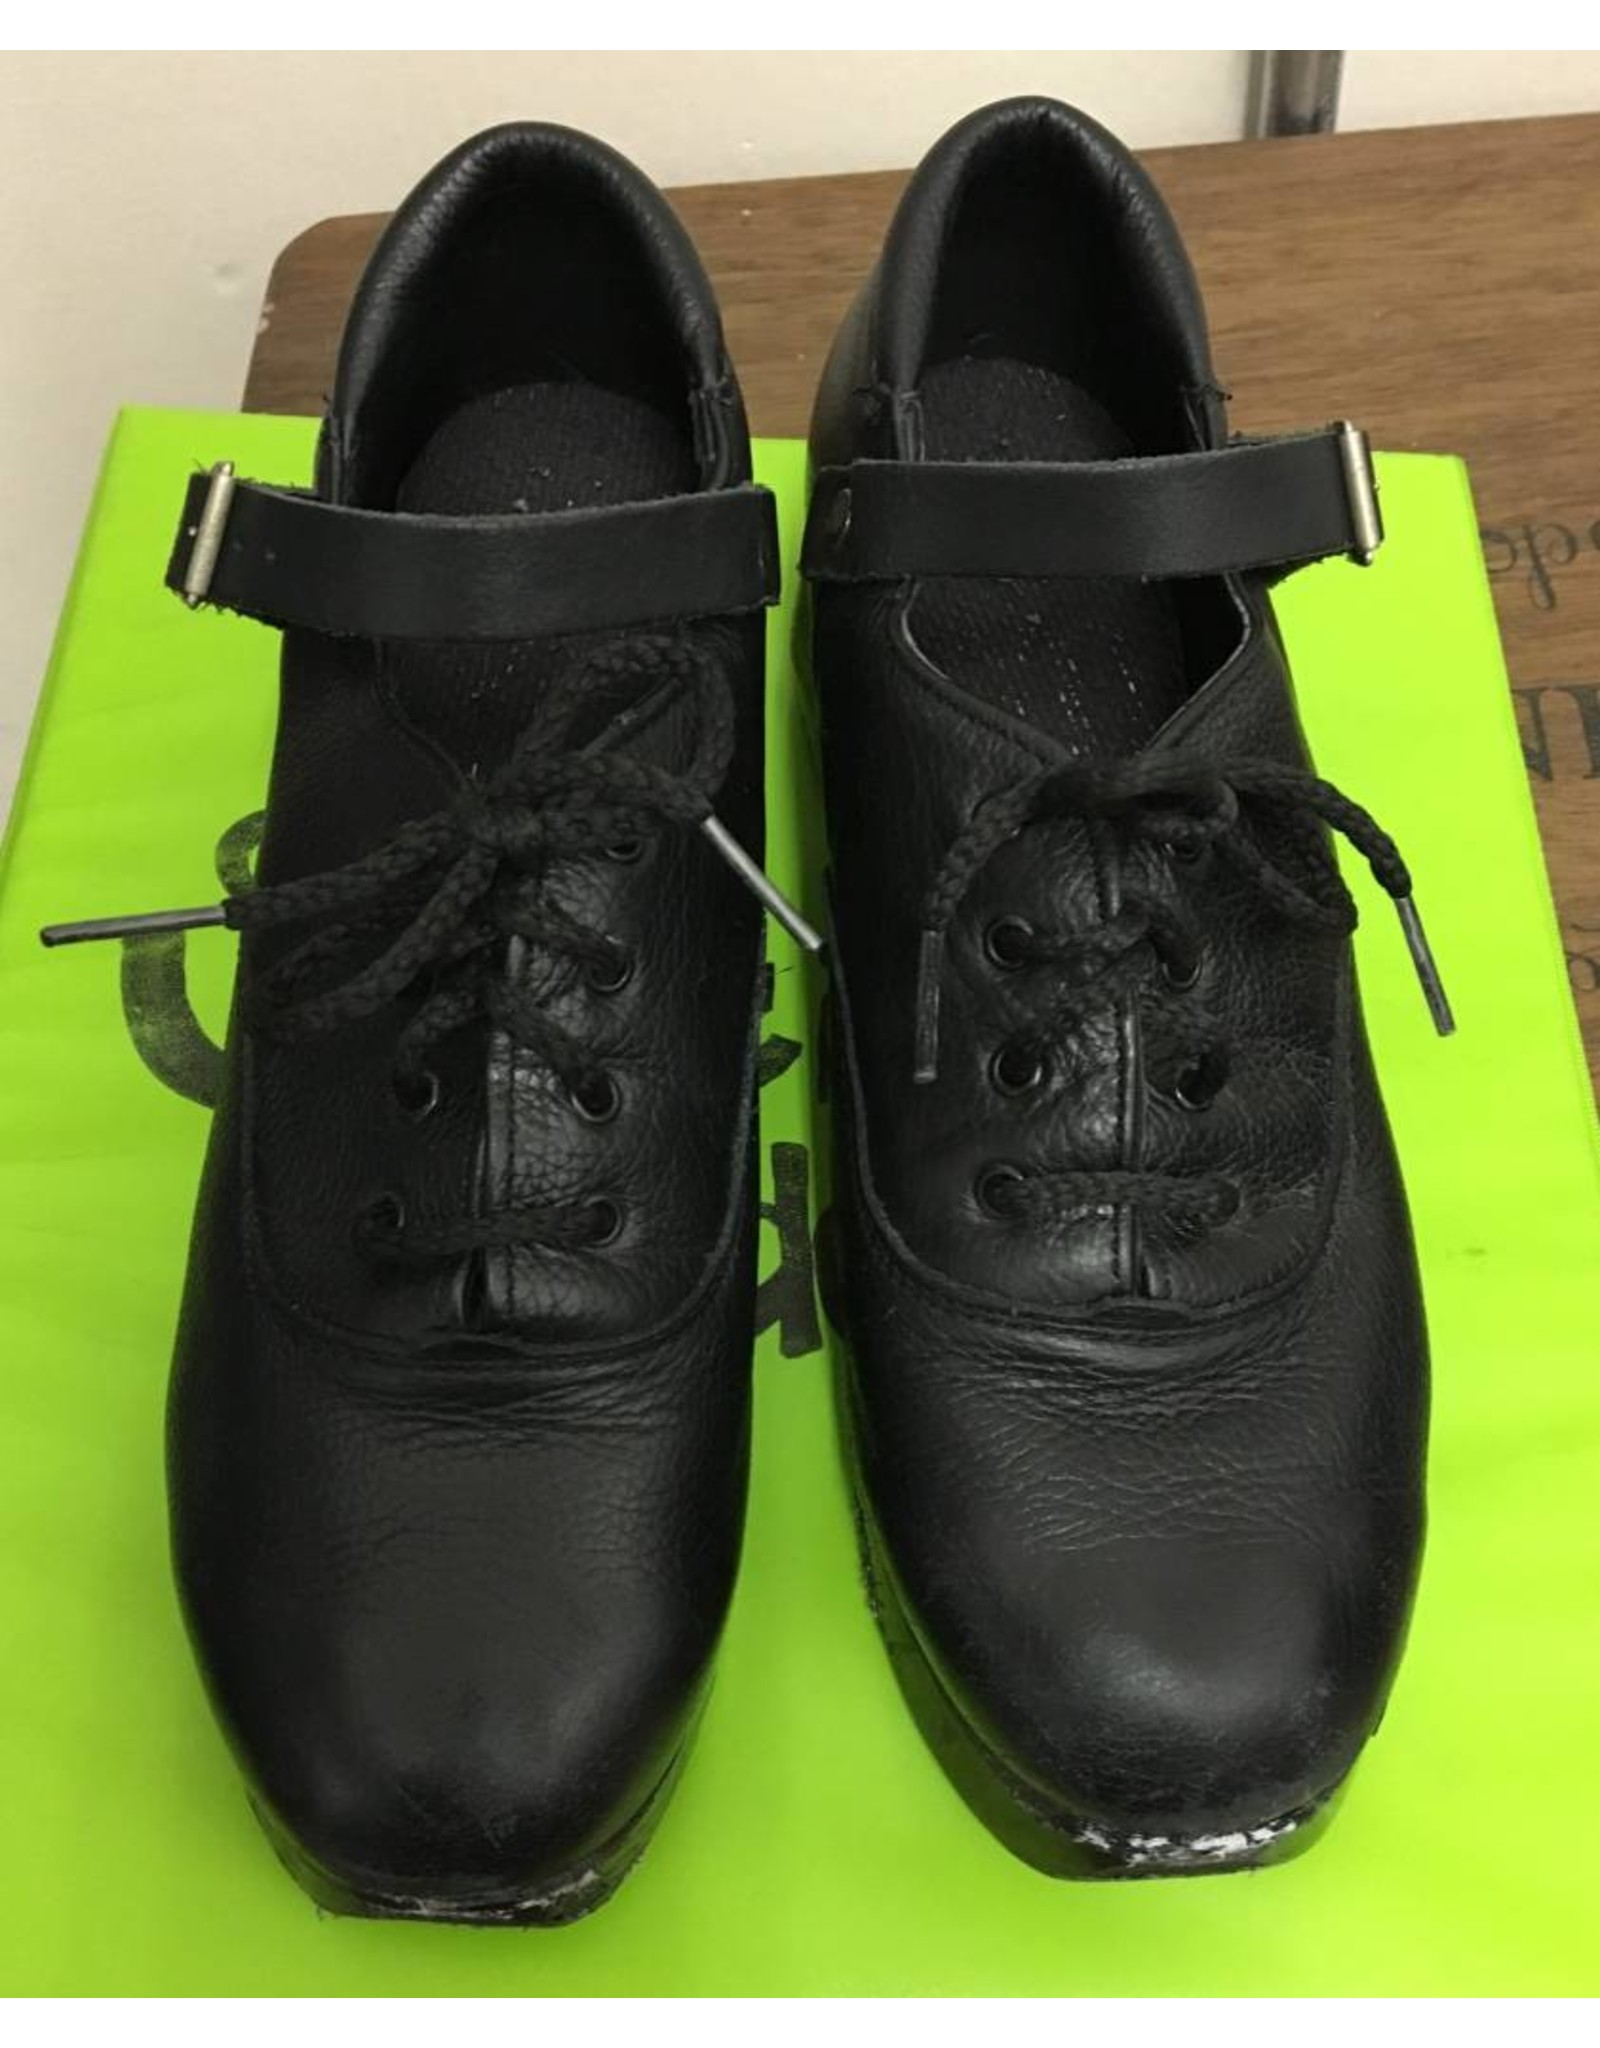 Rutherford Used Irish Hard Shoes